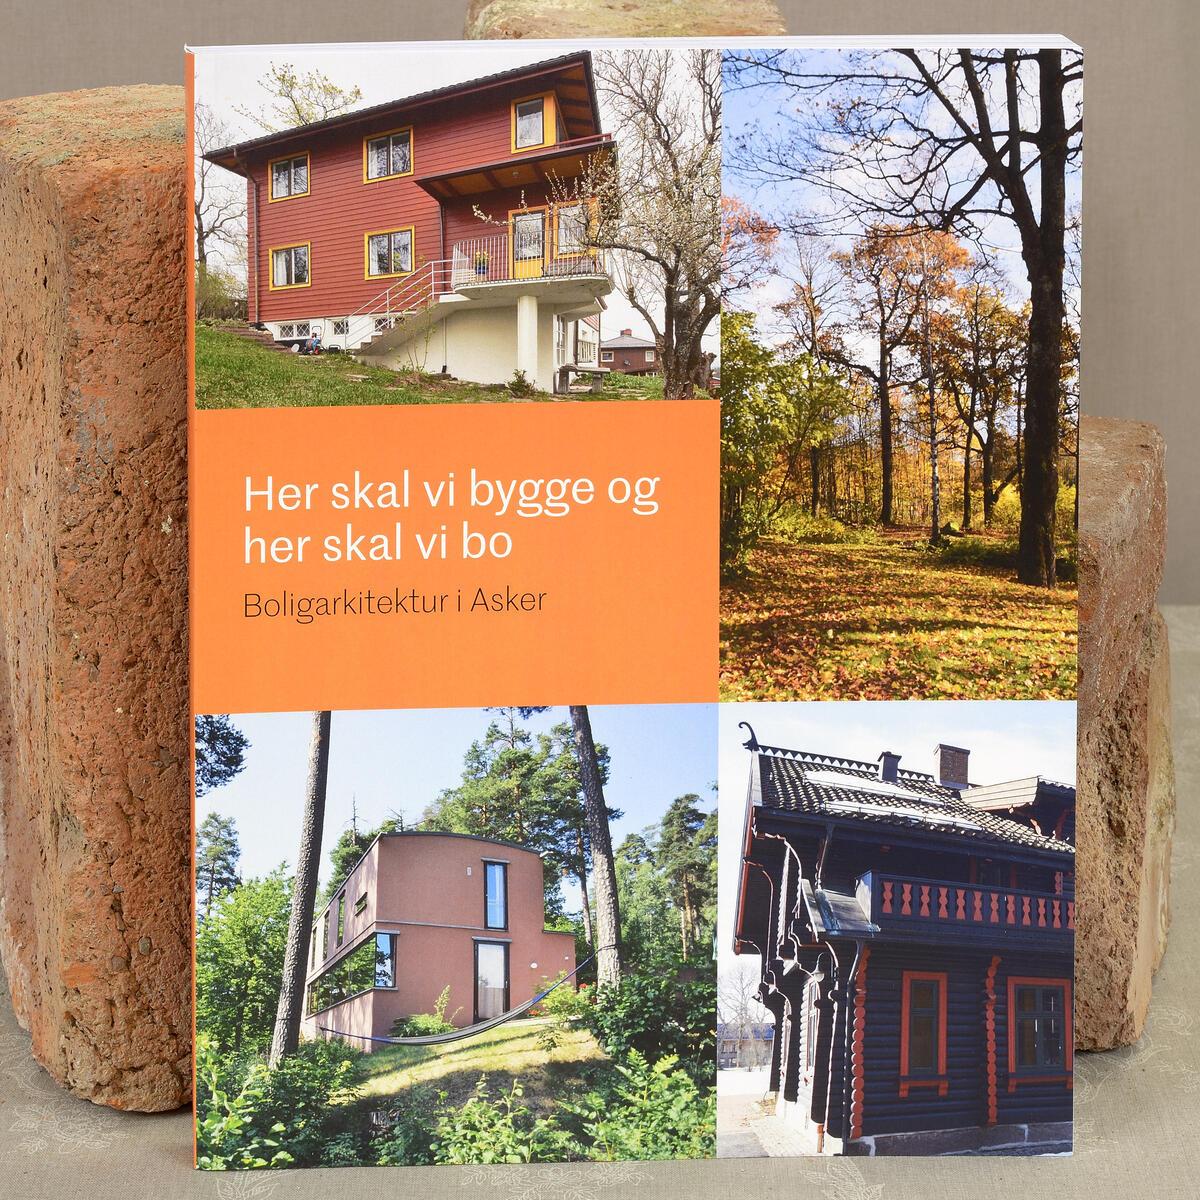 Her skal vi bygge og her skal vi bo, Boligarkitektur i Asker. 160 sider med spennende lesestoff og flotte bilder. kr. 250,- (Foto/Photo)